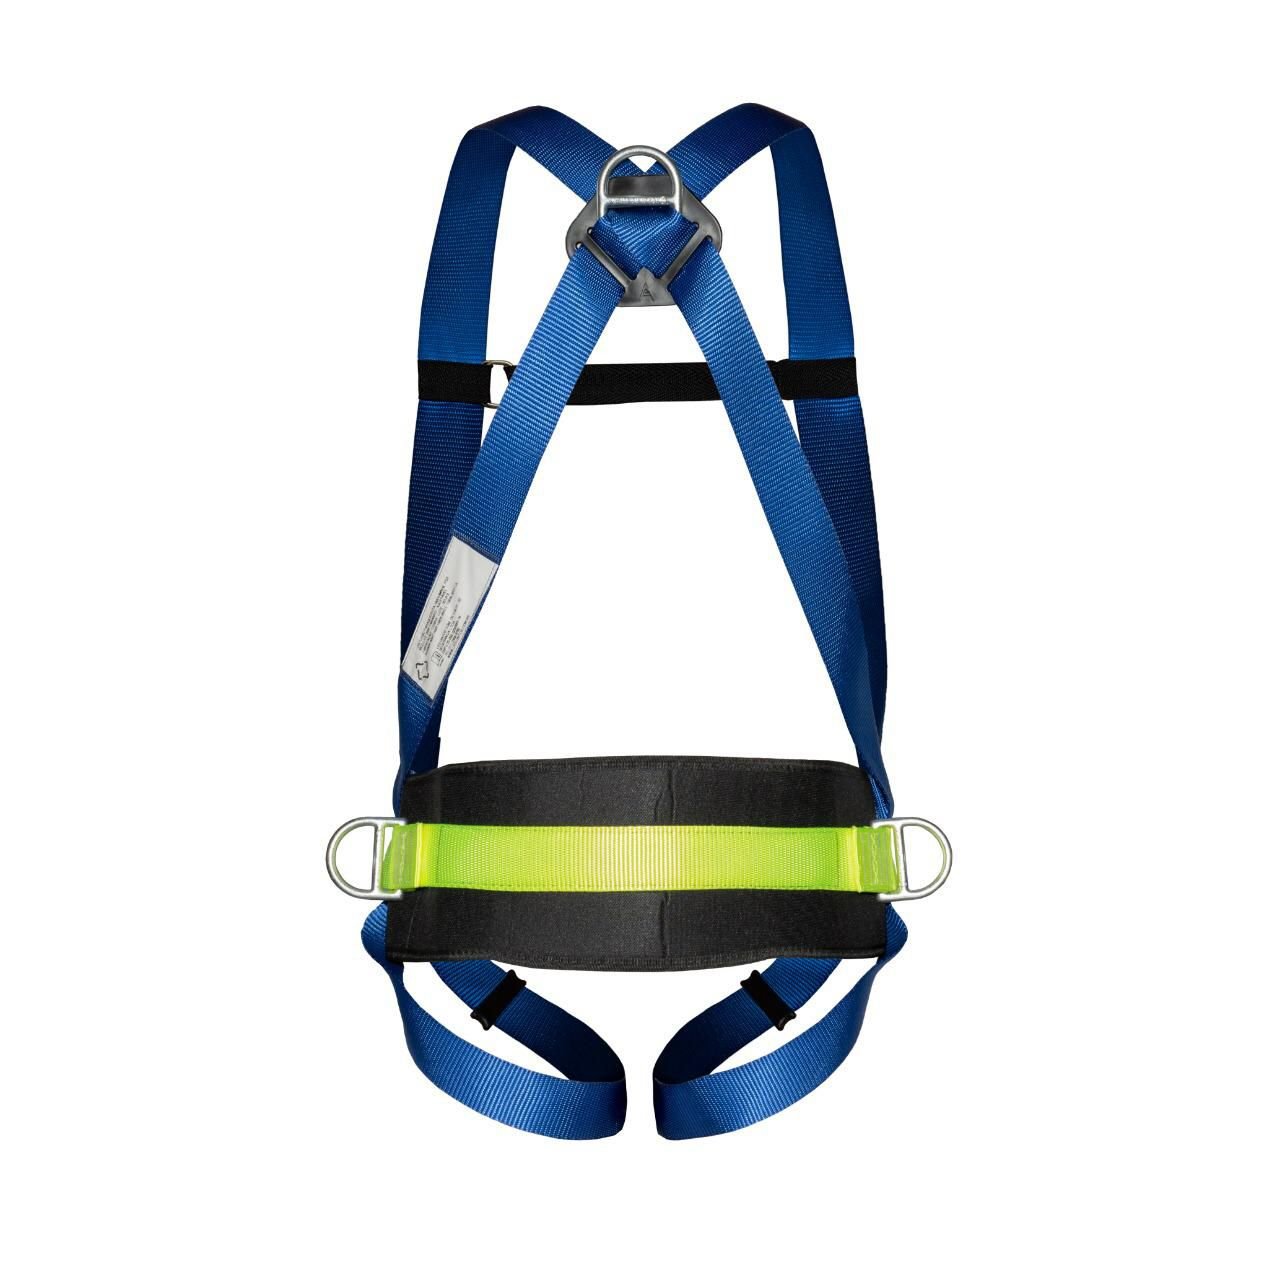 Cinturão Paraquedista 3 Ponto de Ancoragem Com Talabarte Y 55 ABS